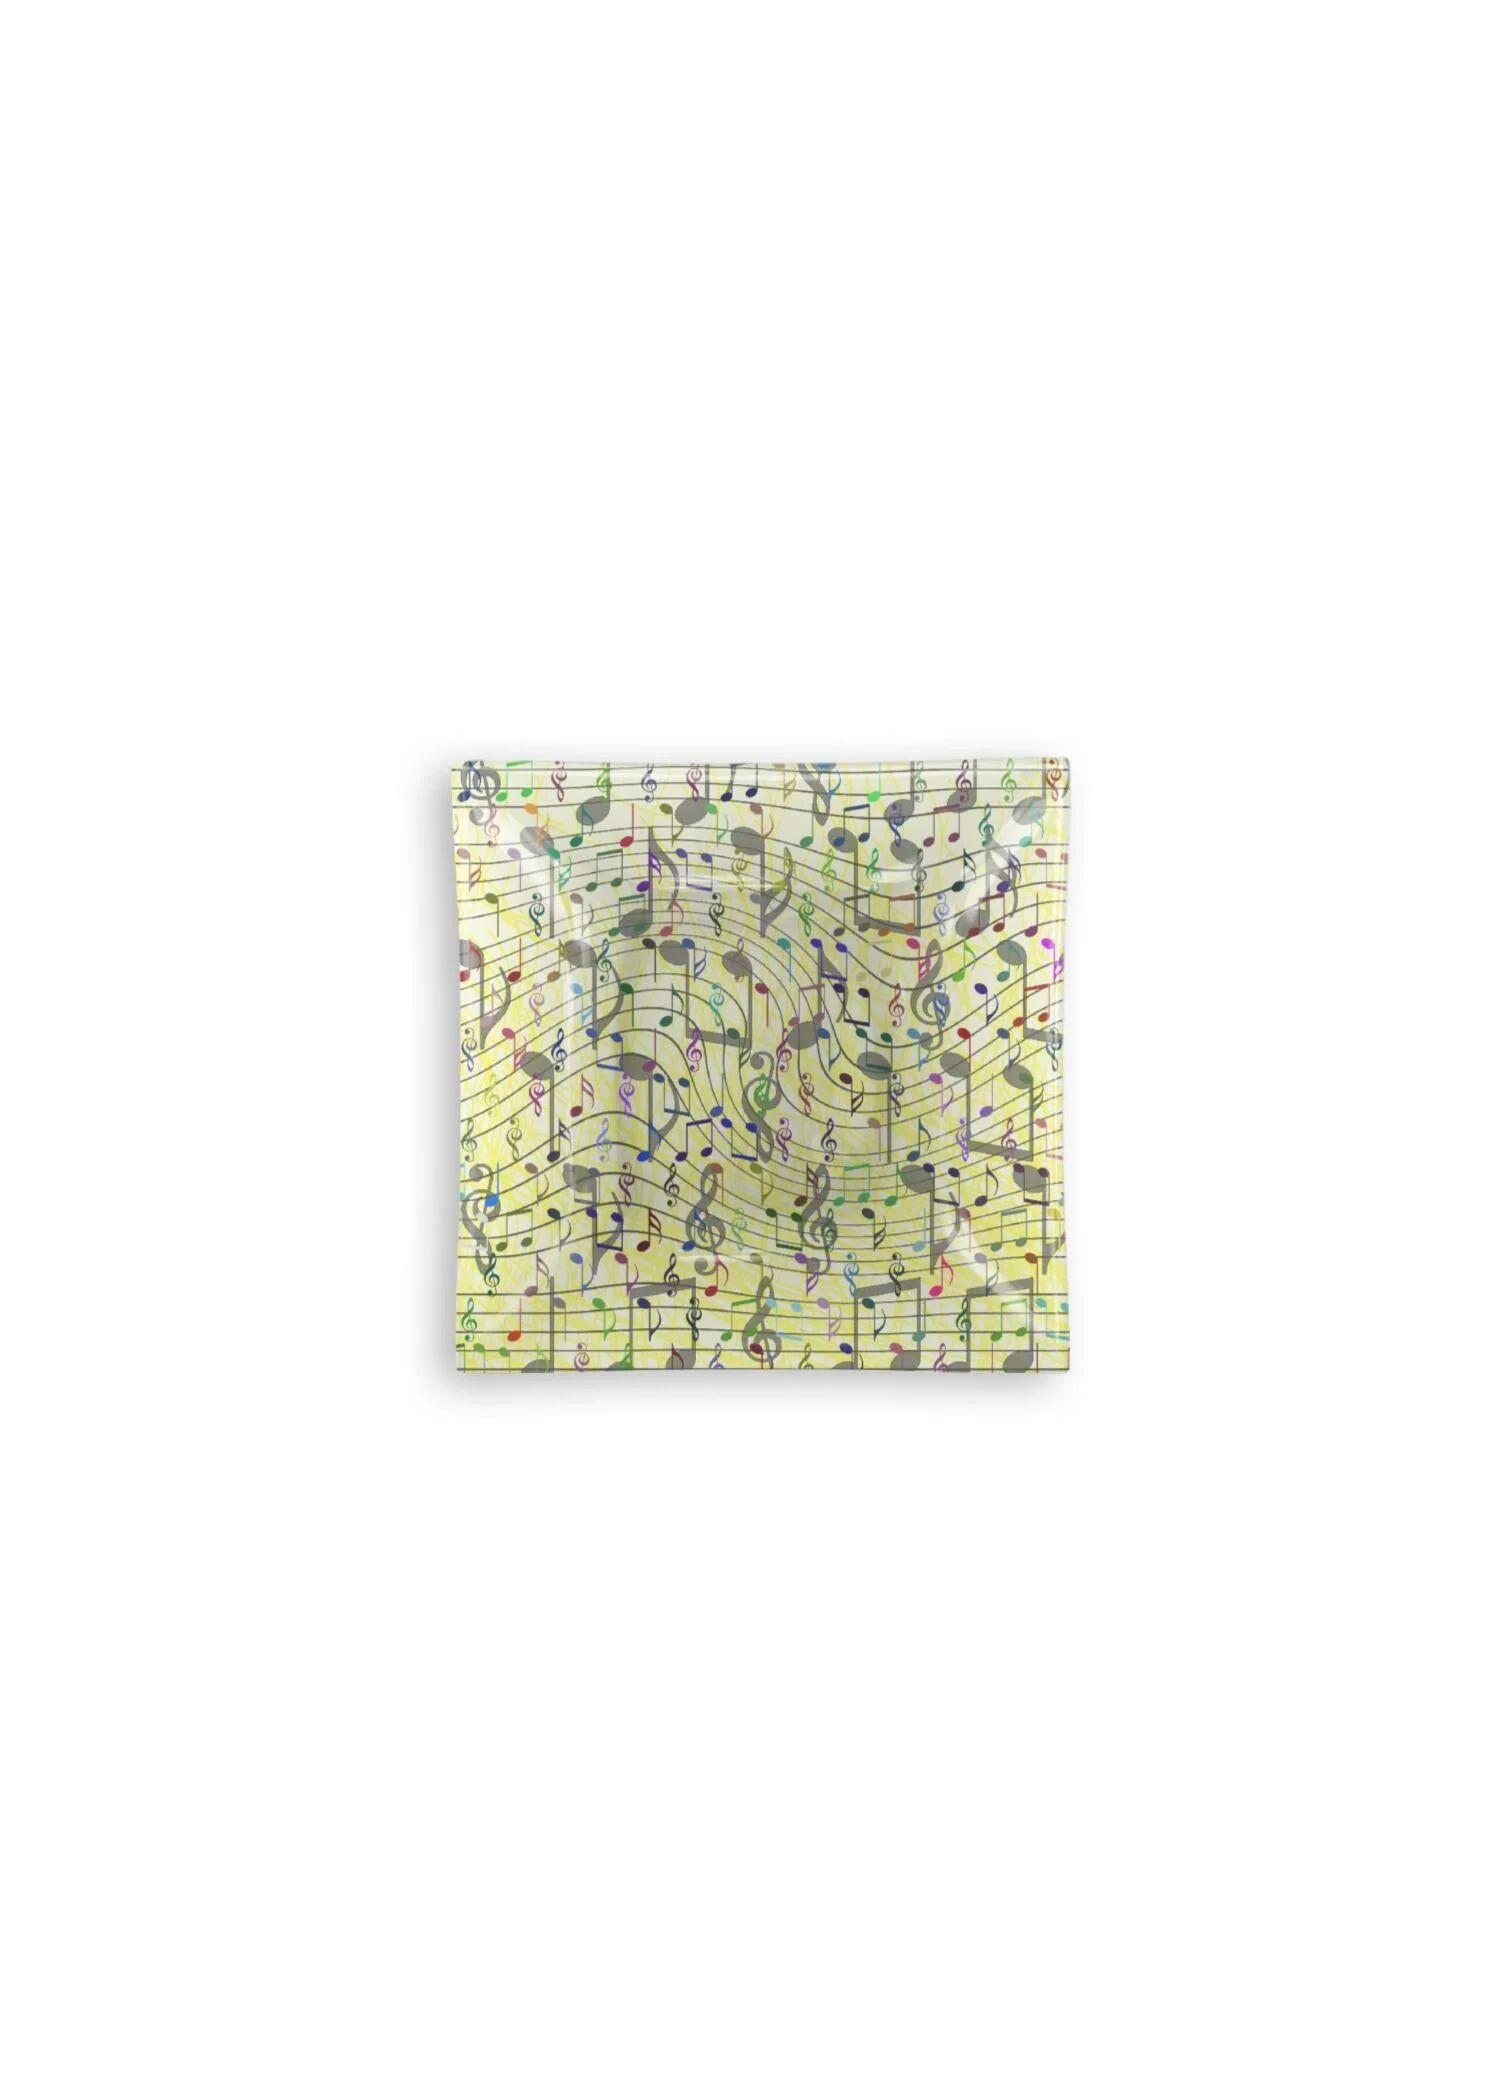 VIDA Square Glass Tray - Chaotic Music Notation by VIDA Original Artist  - Size: Large